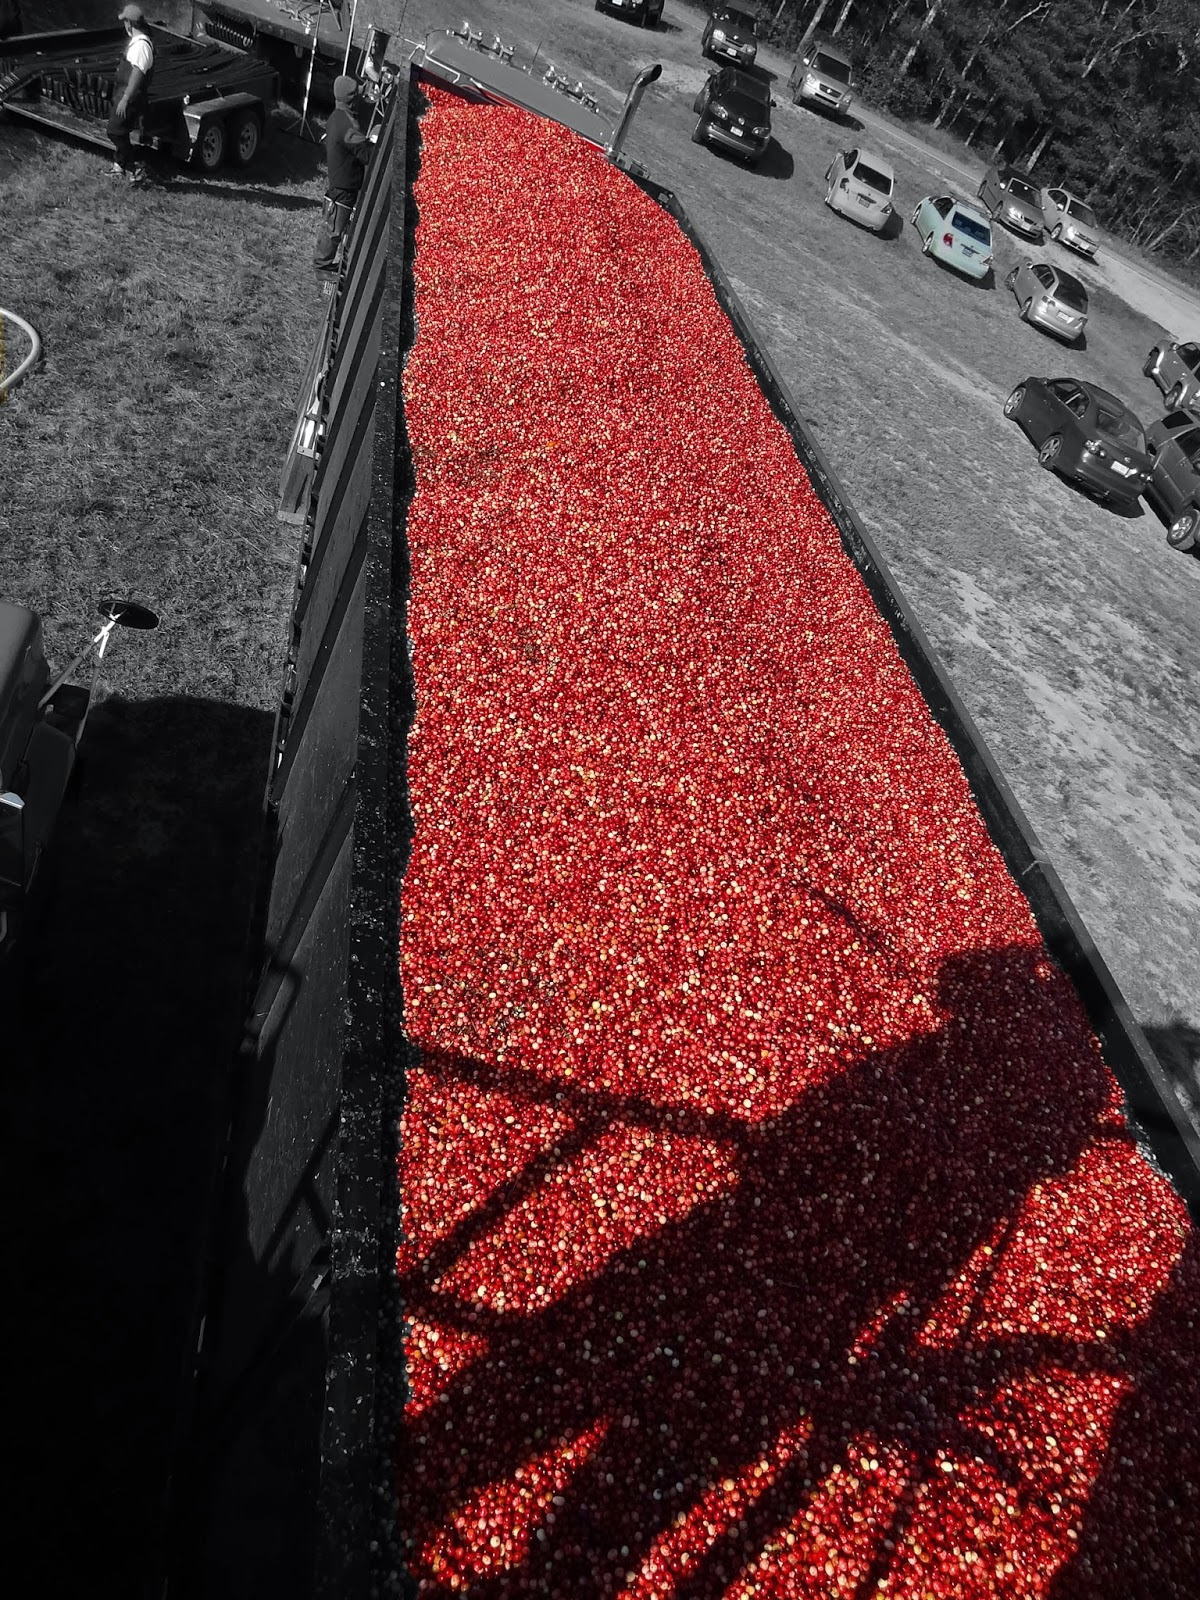 Joe S Retirement Blog A Cranberry Harvest Slocum Gibbs